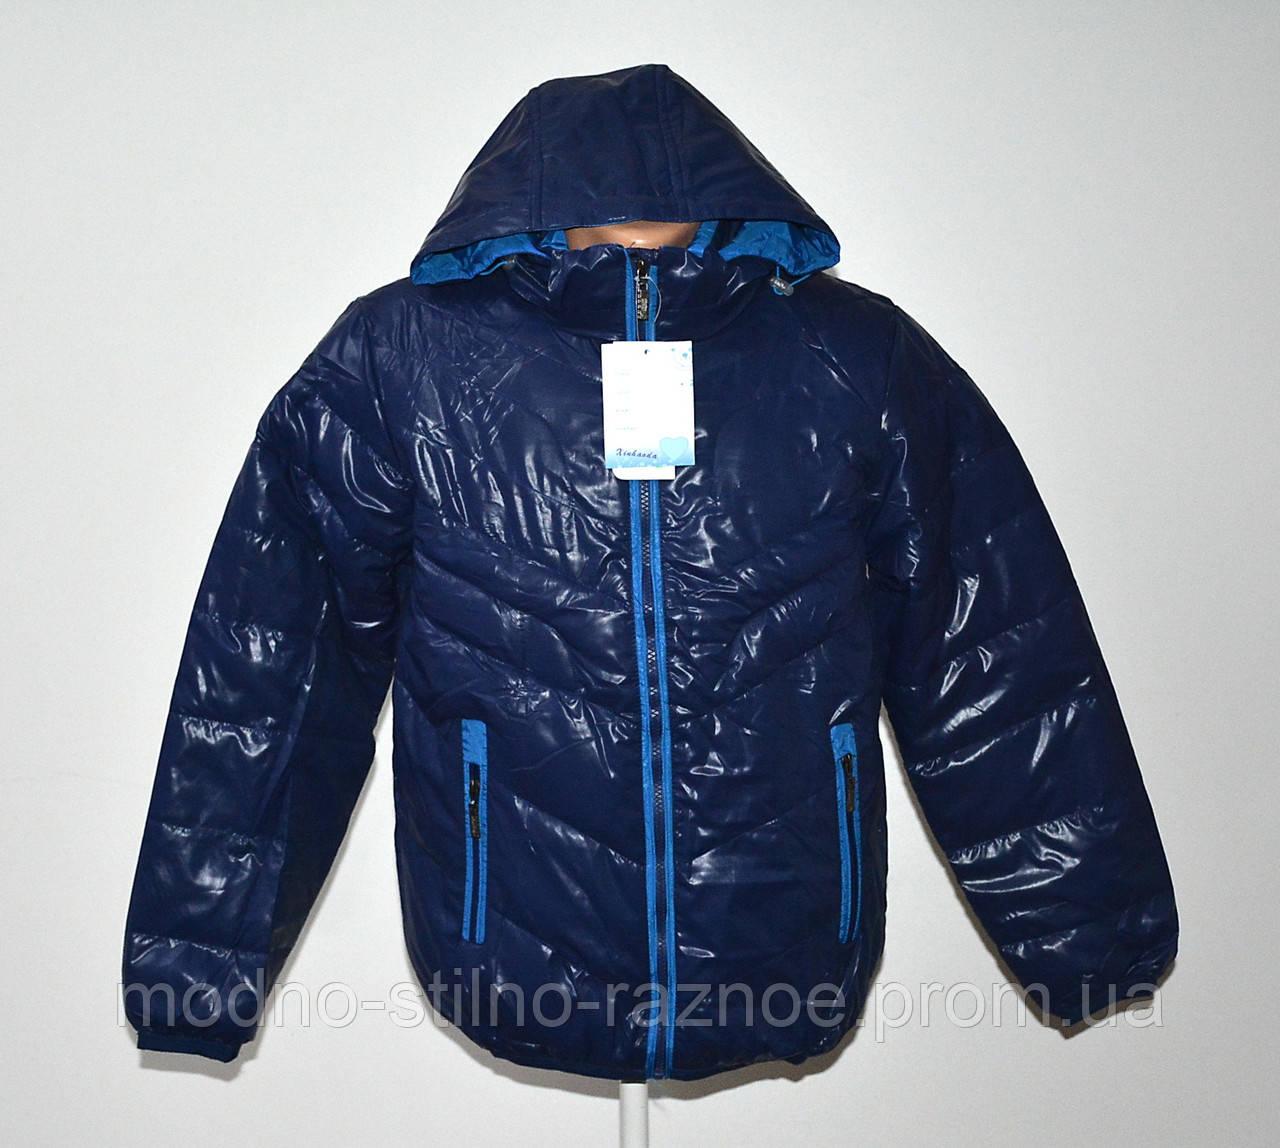 Деми куртка  на мальчика 10-11 лет